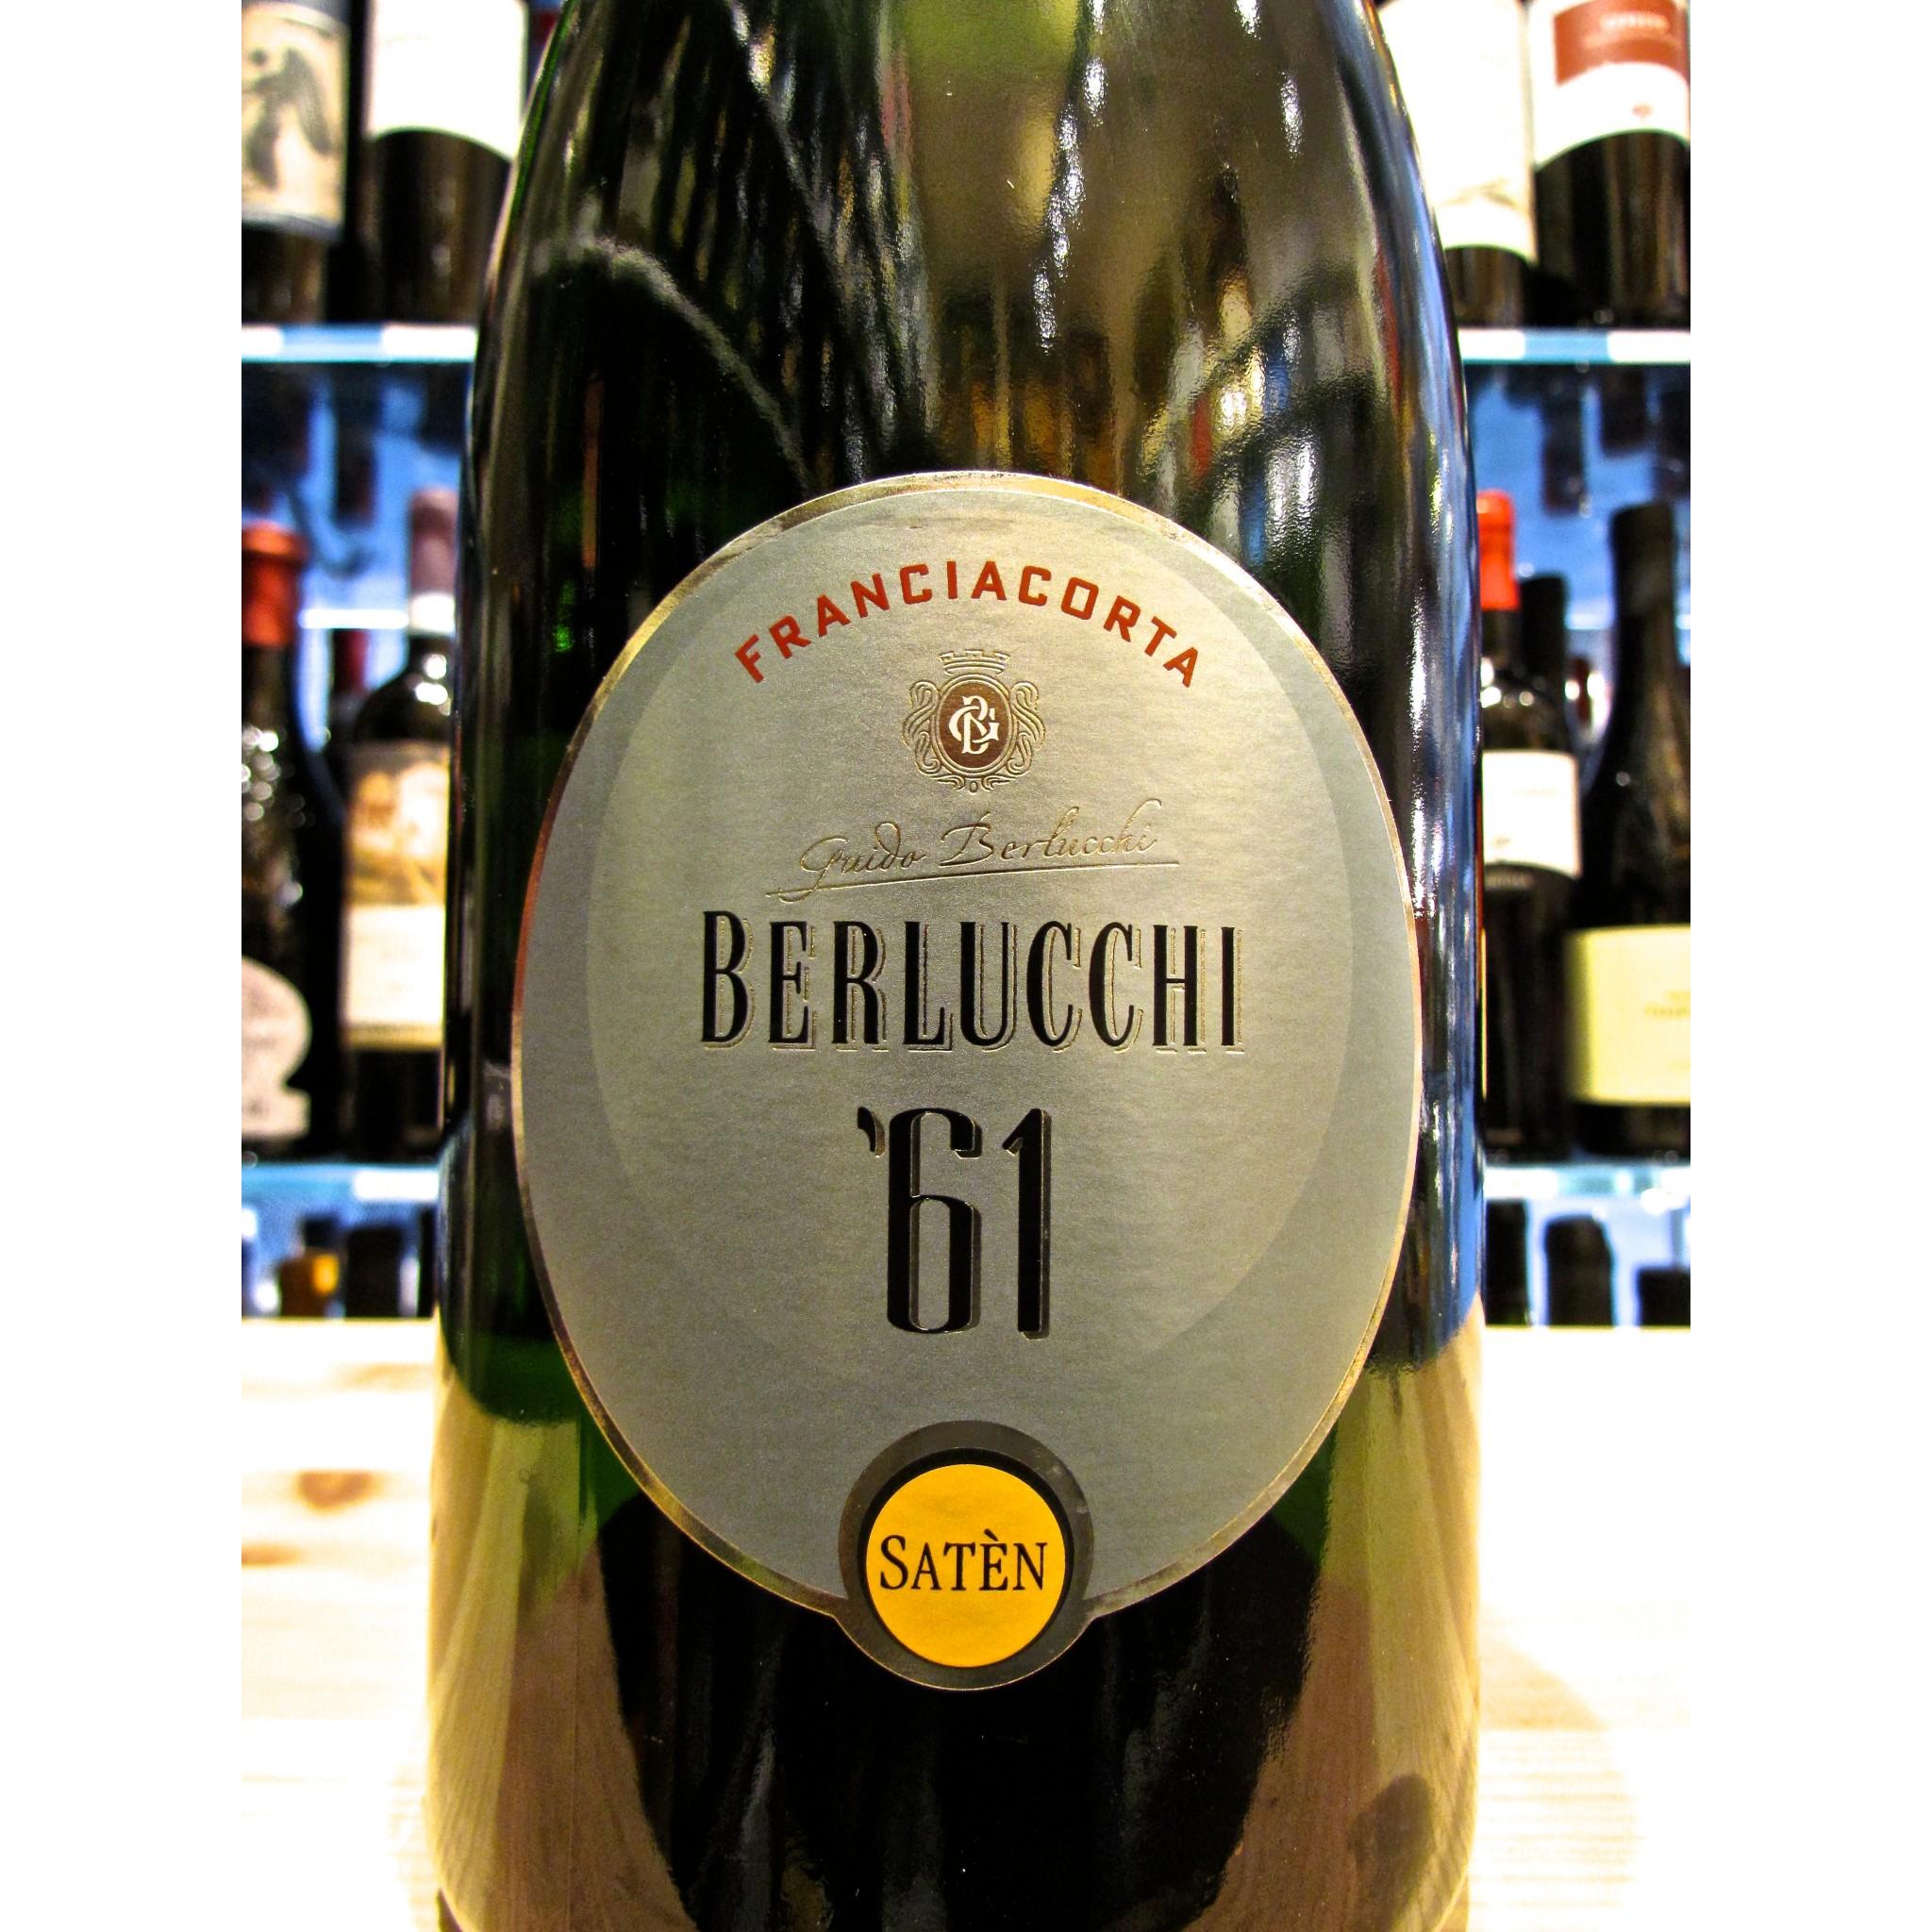 Franciacorta Berlucchi 61 Saten Sale Online Italian